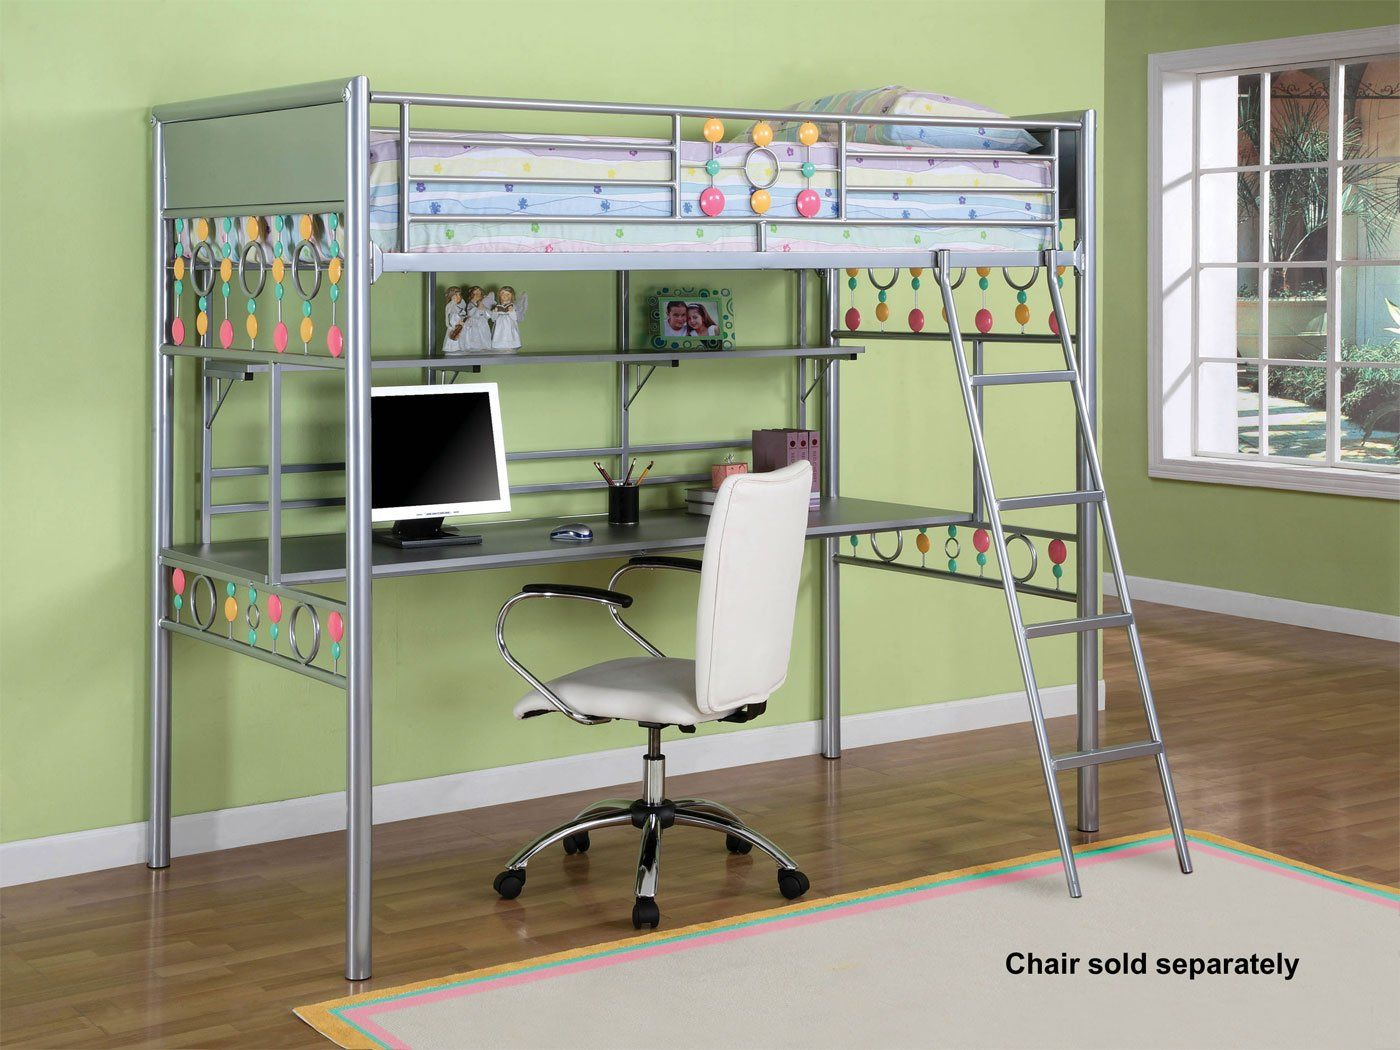 Etagenbett Metall Ikea : Ikea bunk bed and desk living room sets at ashley furniture